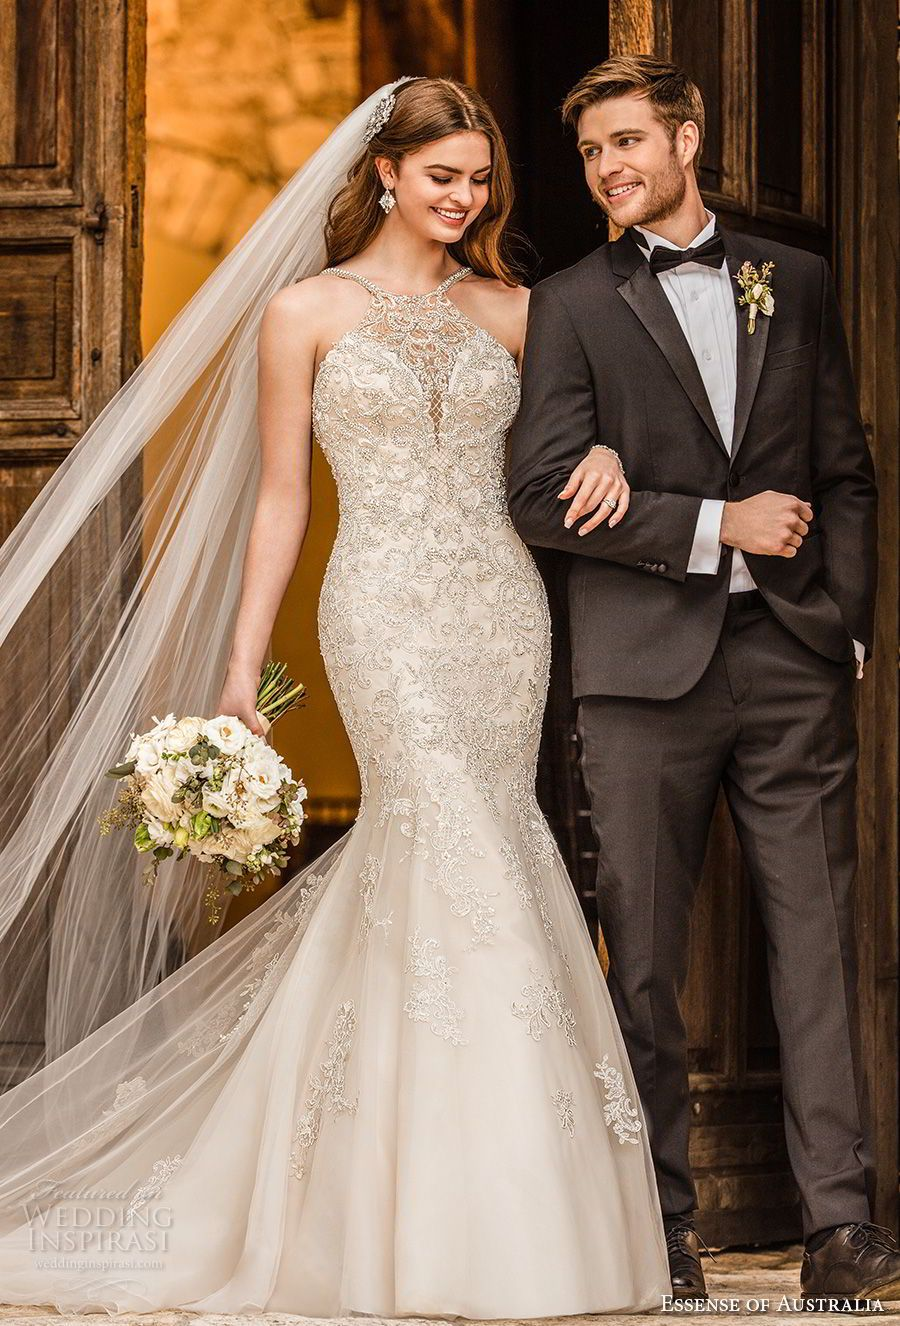 Essense Of Australia Fall 2017 Wedding Dresses Wedding Inspirasi Wedding Dresses Mermaid Wedding Dress Wedding Dresses 2017 [ 1326 x 900 Pixel ]